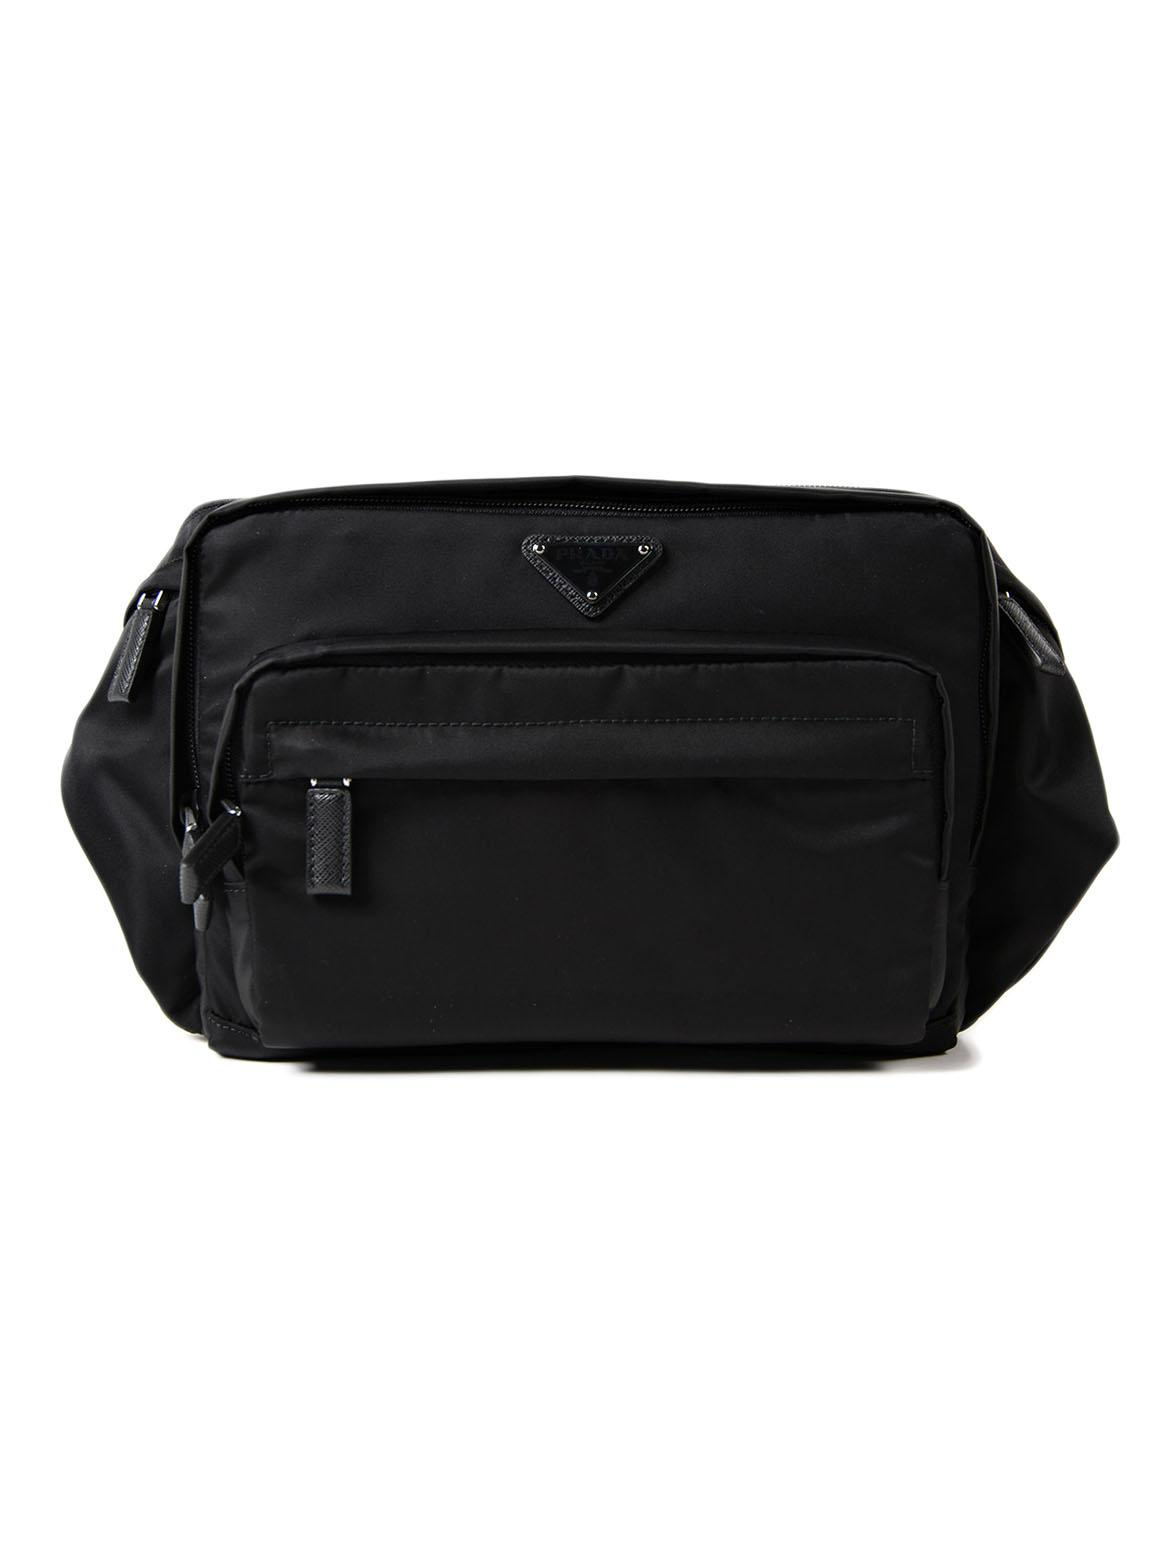 569b4589dd98 Prada Tessuto Montagna Belt Bag in Black for Men - Lyst